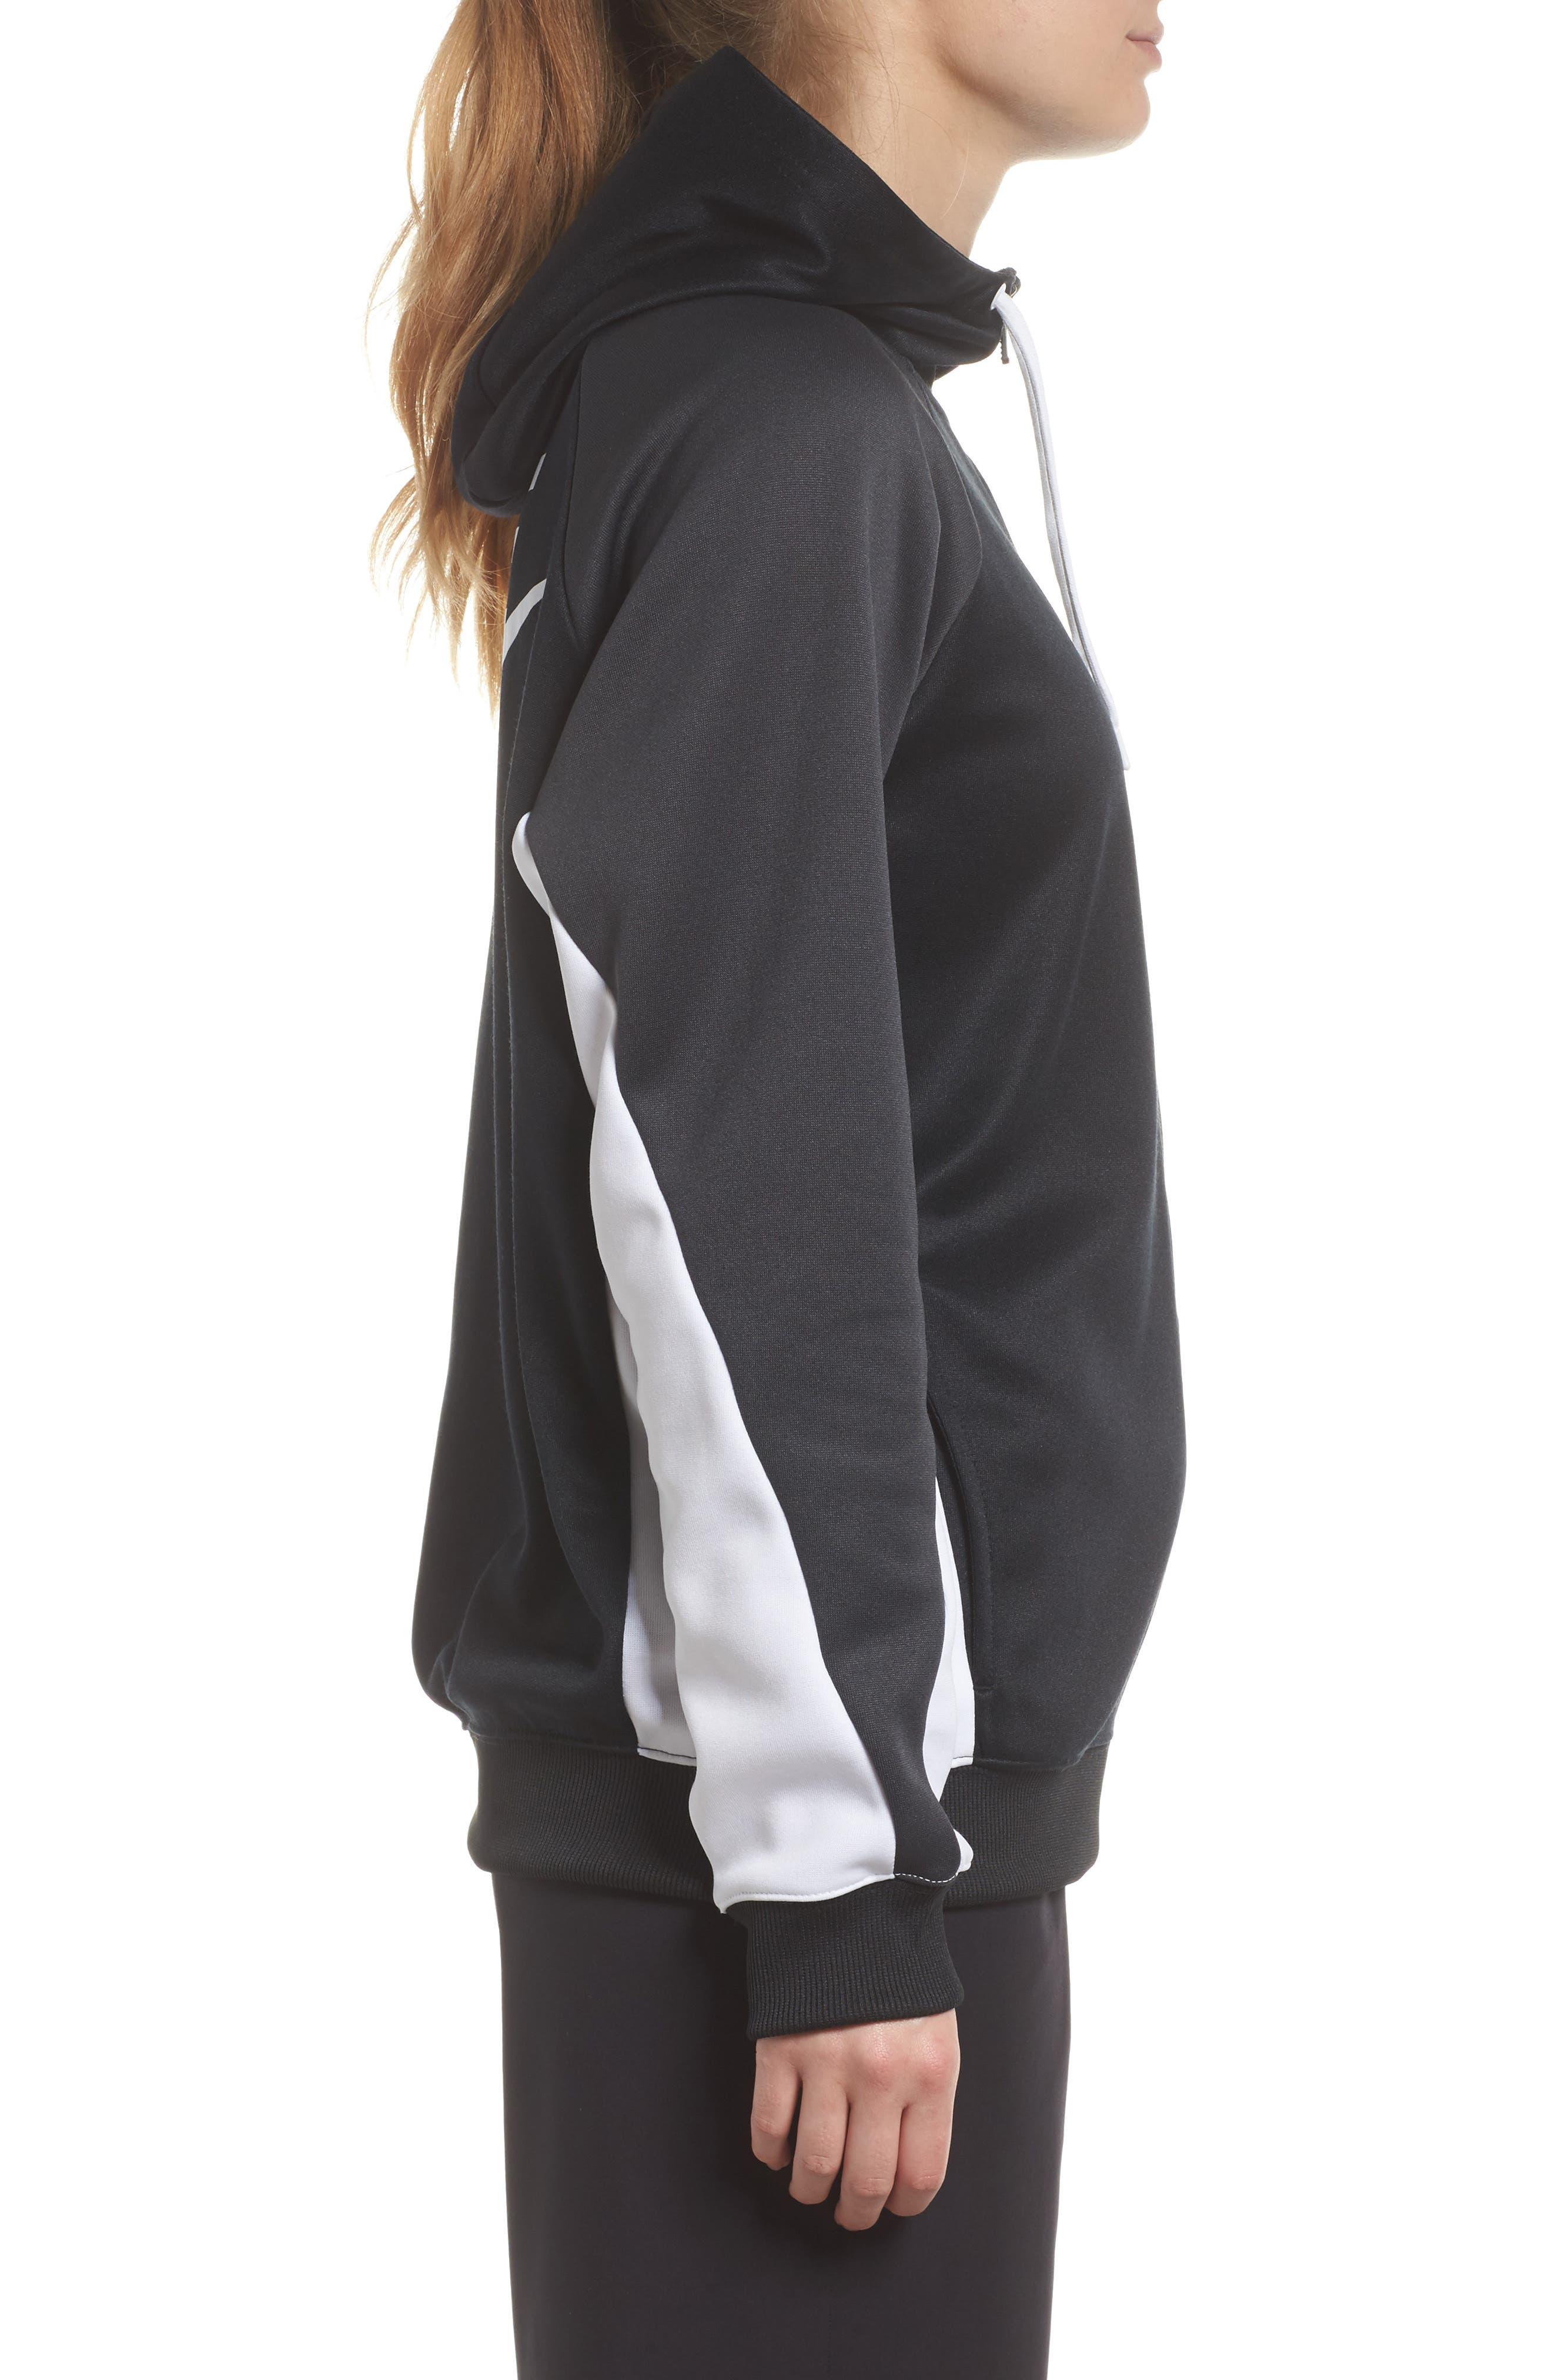 Sportswear Women's Zip Hoodie,                             Alternate thumbnail 4, color,                             010